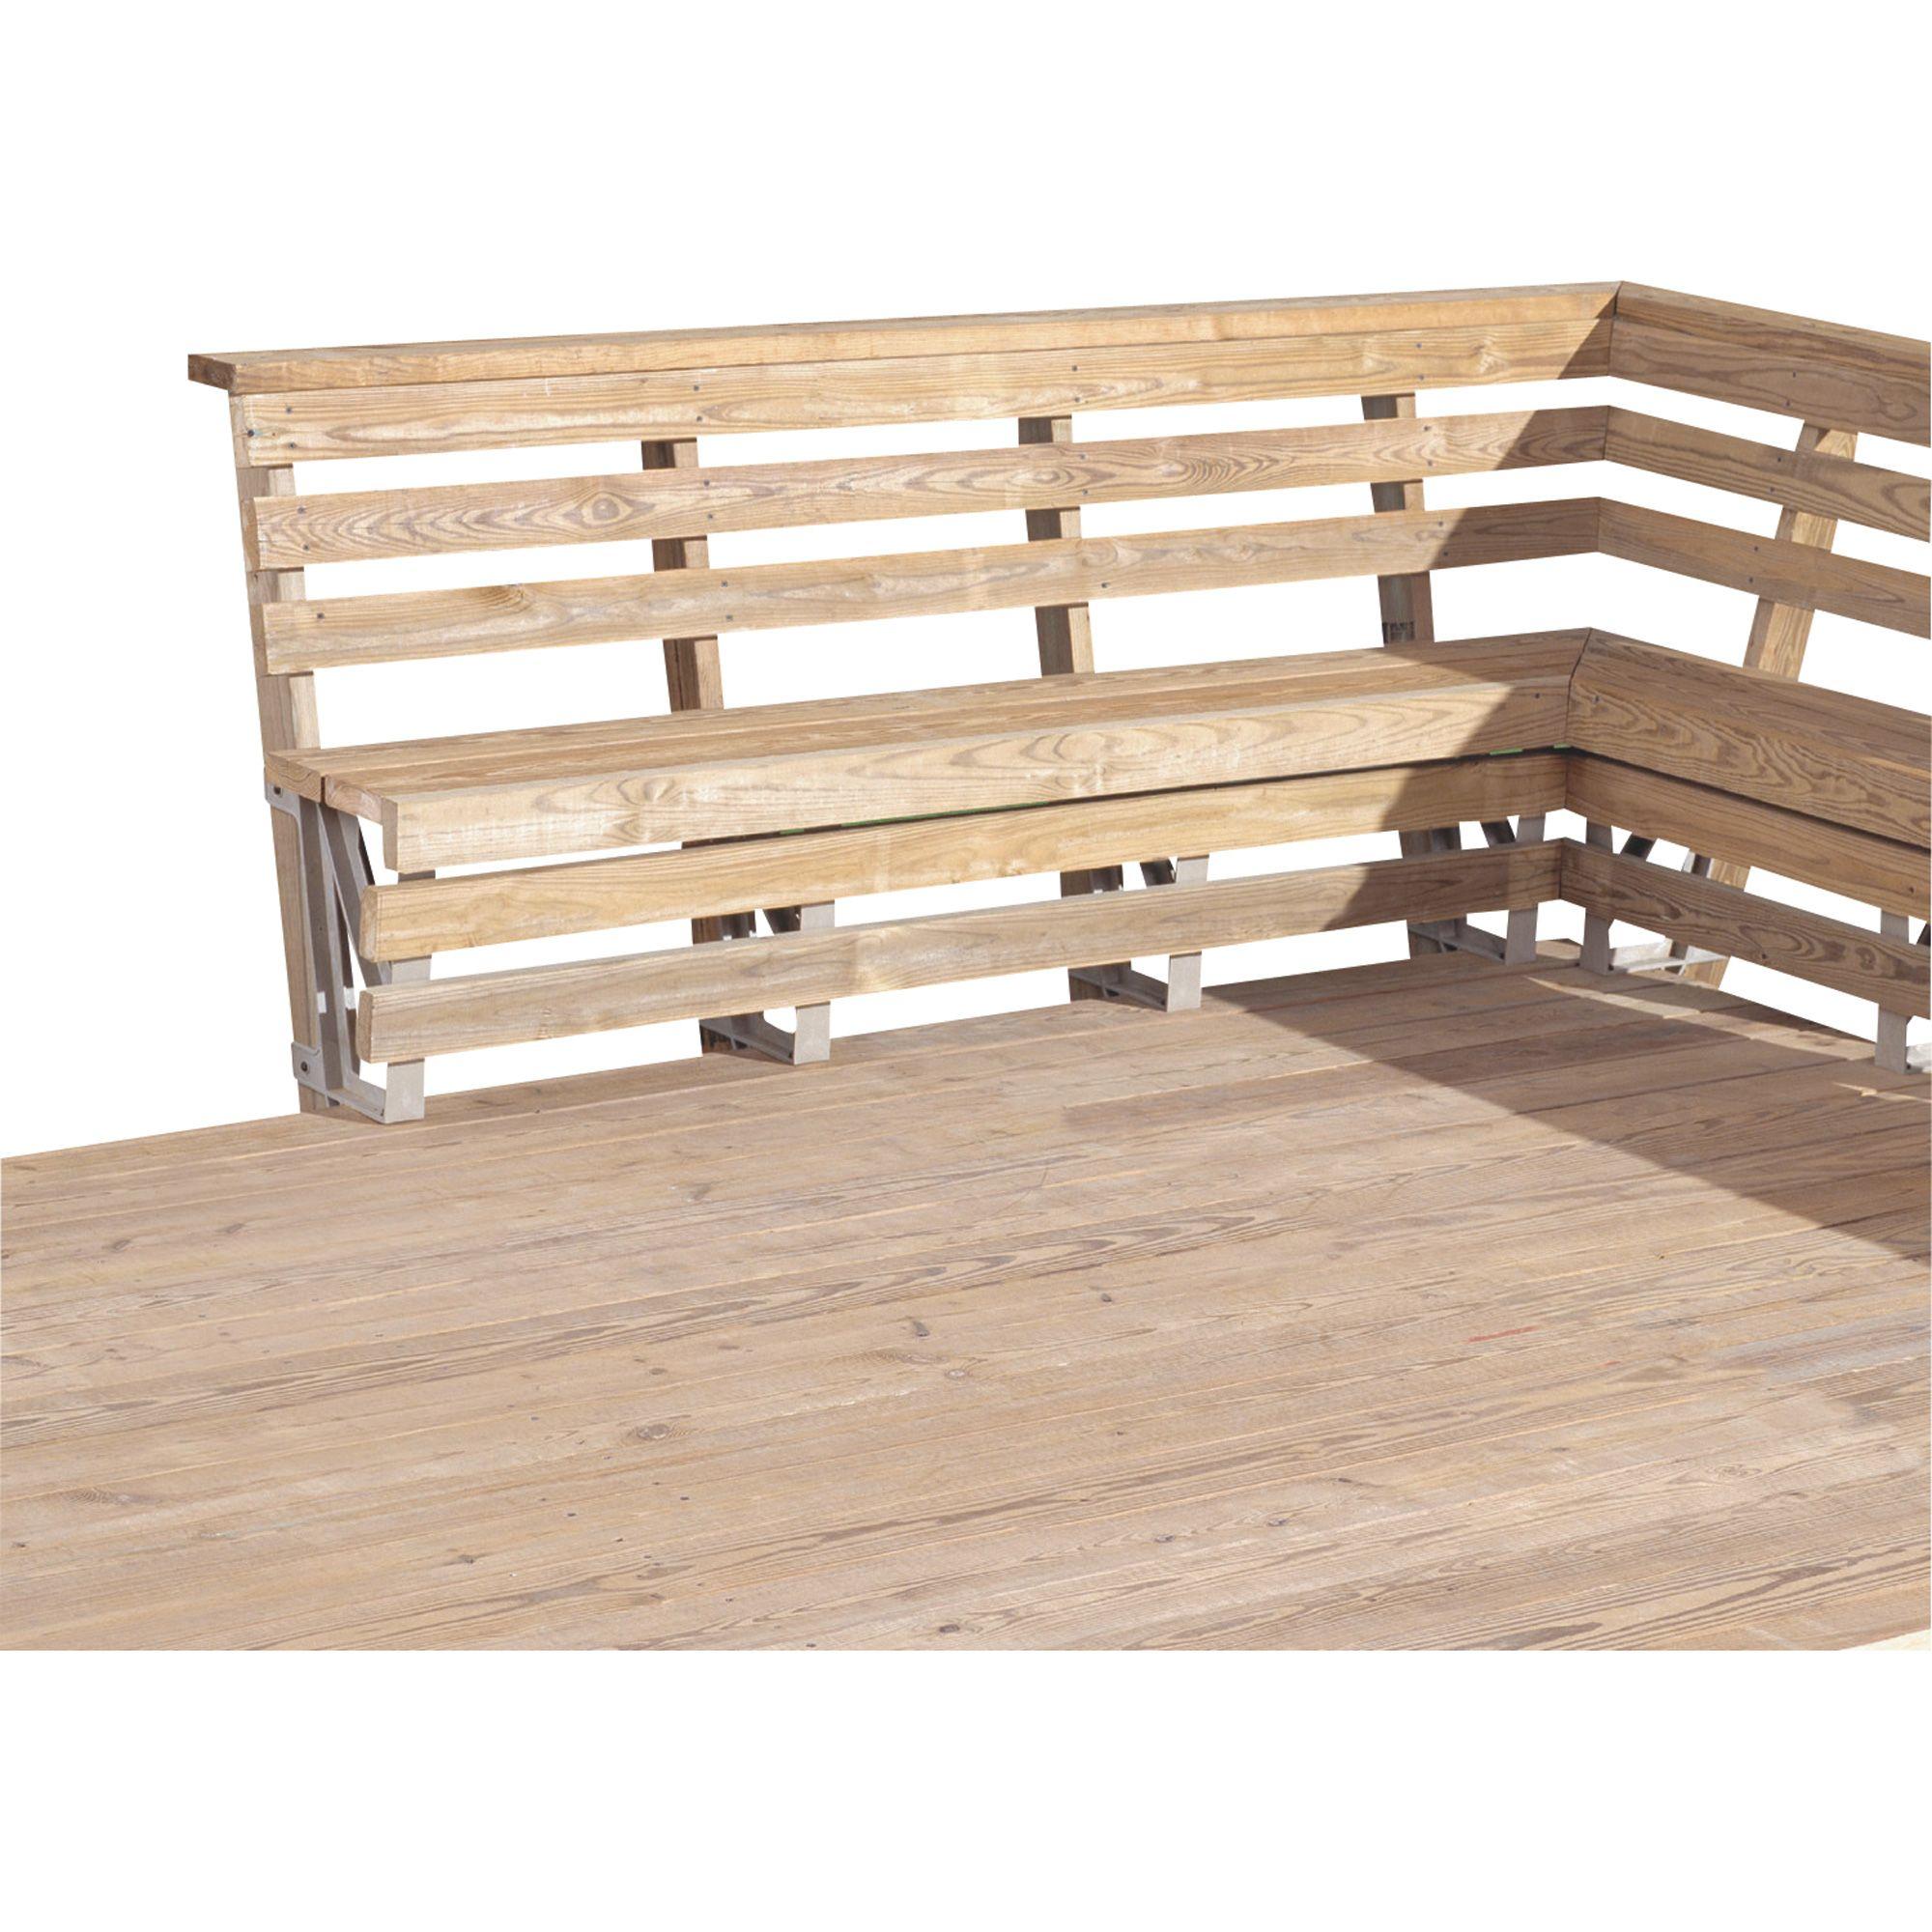 X basics deck bench brackets u sand pk model in